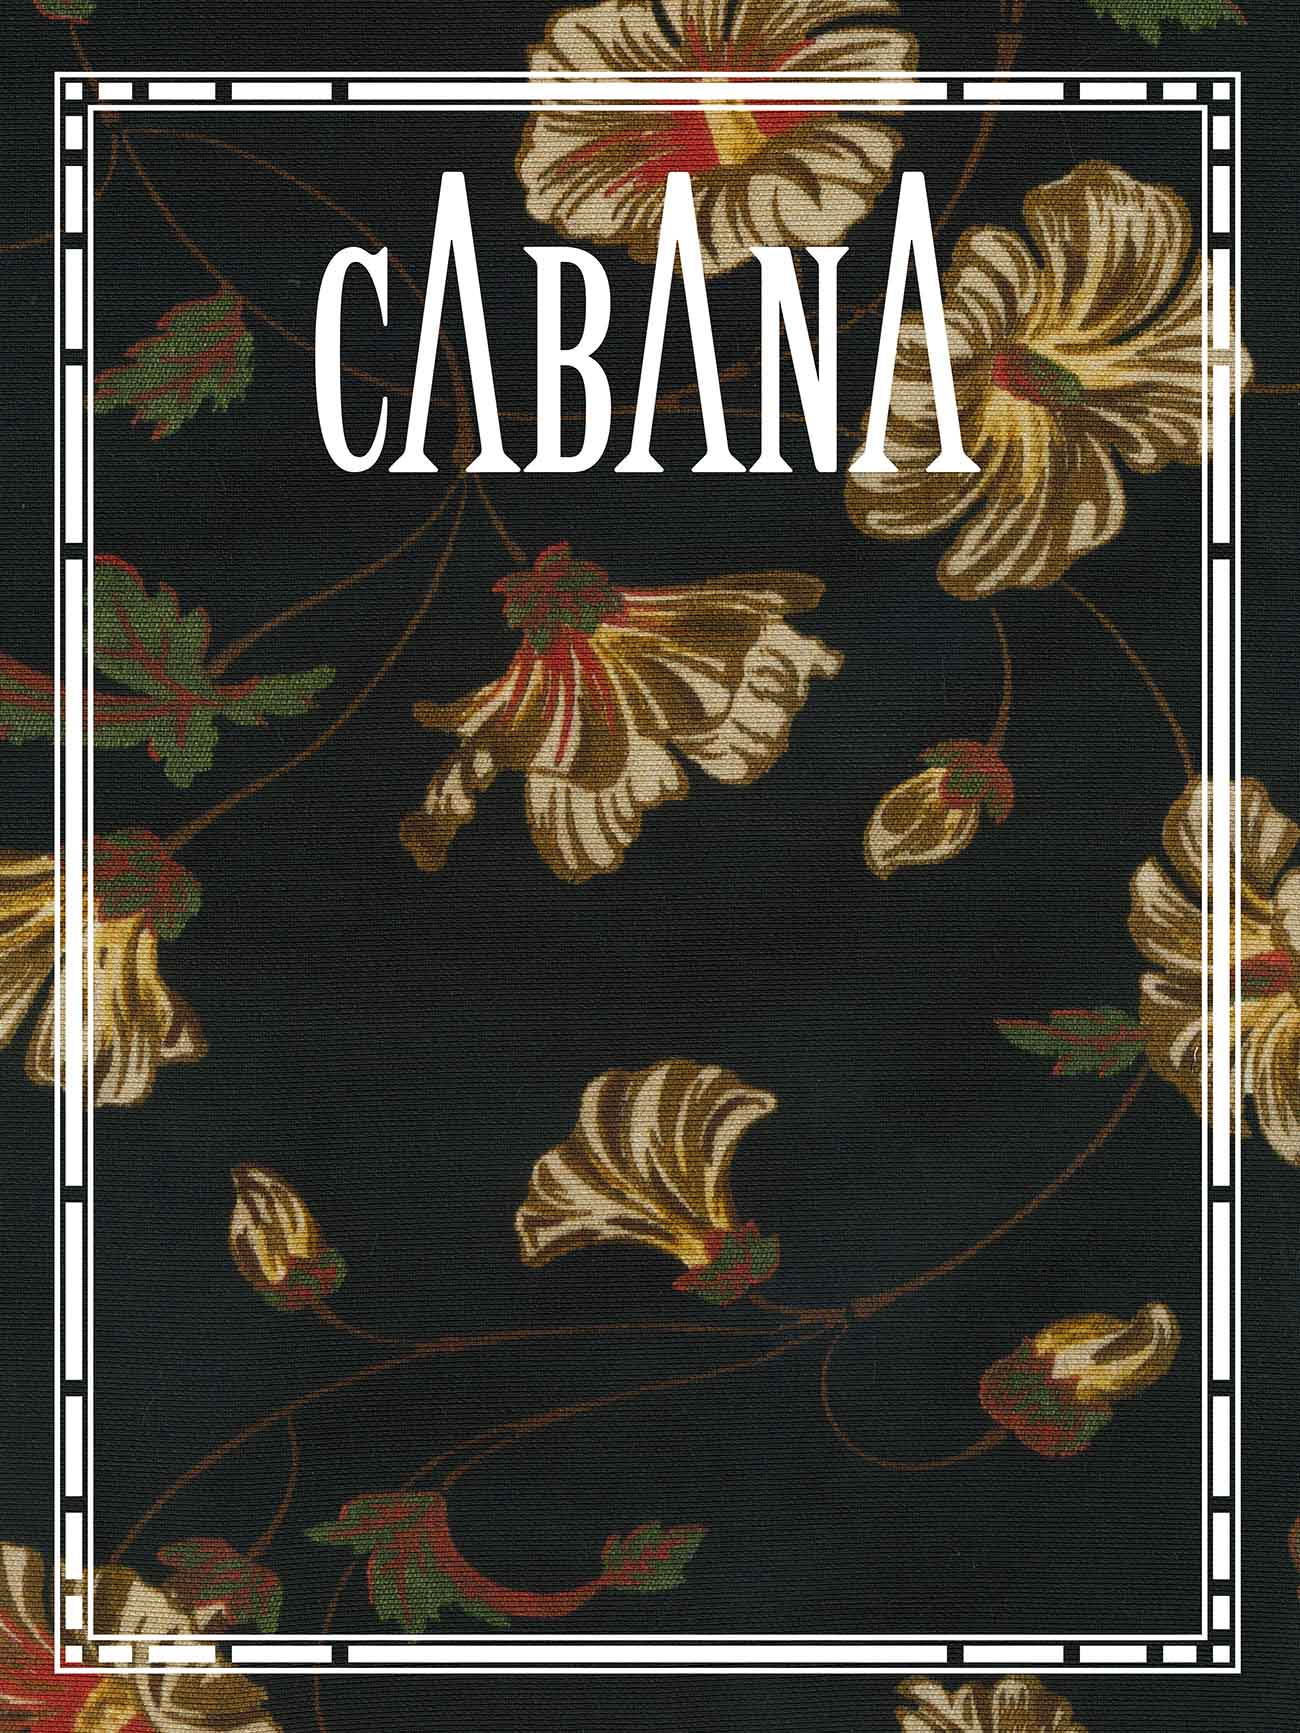 CABANA_Color_009.jpg